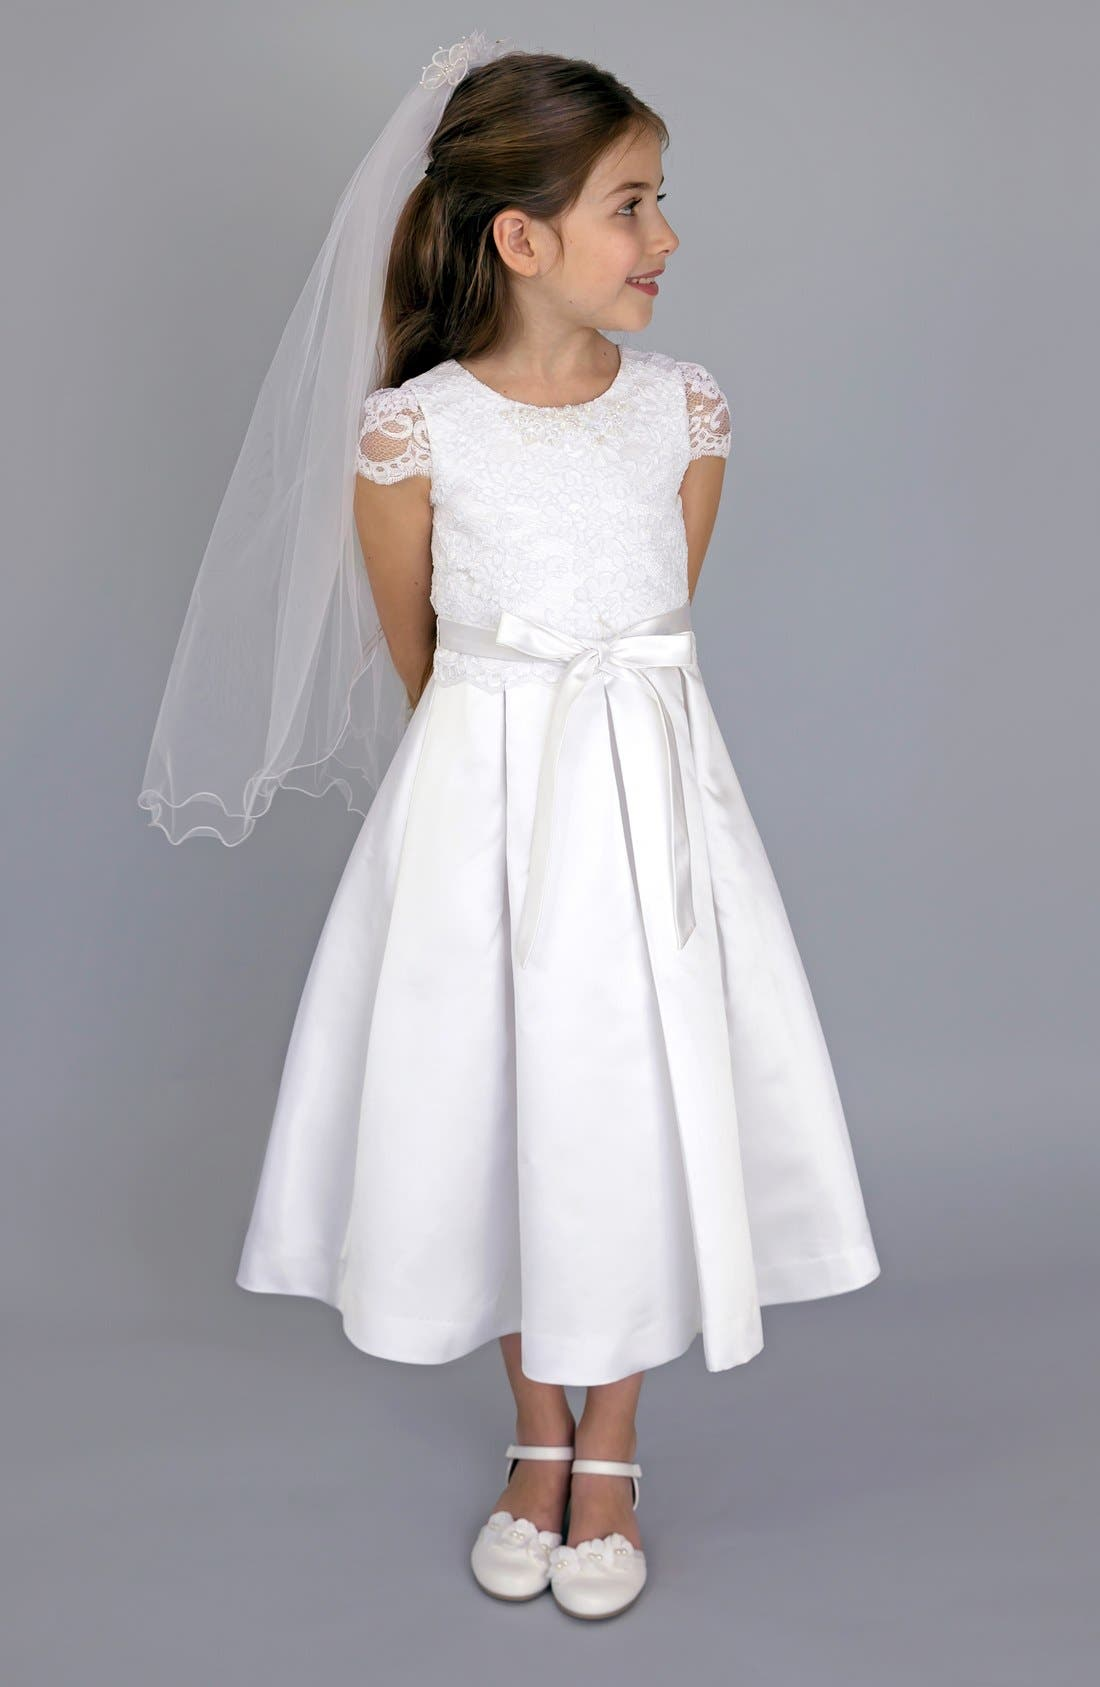 Lace Bodice Box Pleat Dress,                         Main,                         color, White